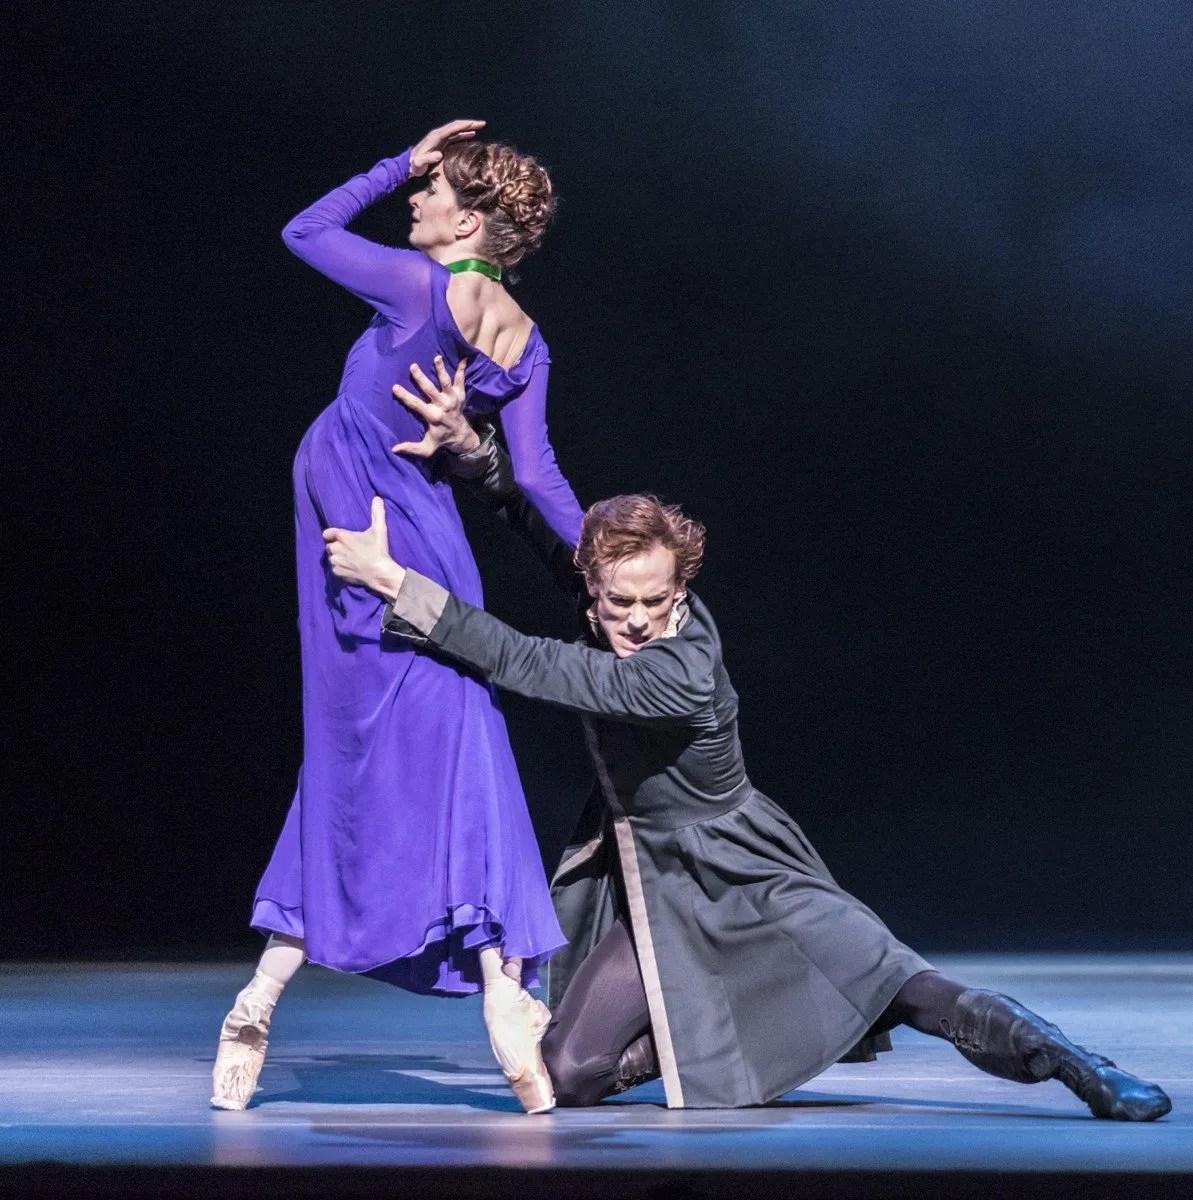 The Winter's Tale. Lauren Cuthbertson as Hermoine, Edward Watson as Leontes. © ROH, Johan Persson, 2014